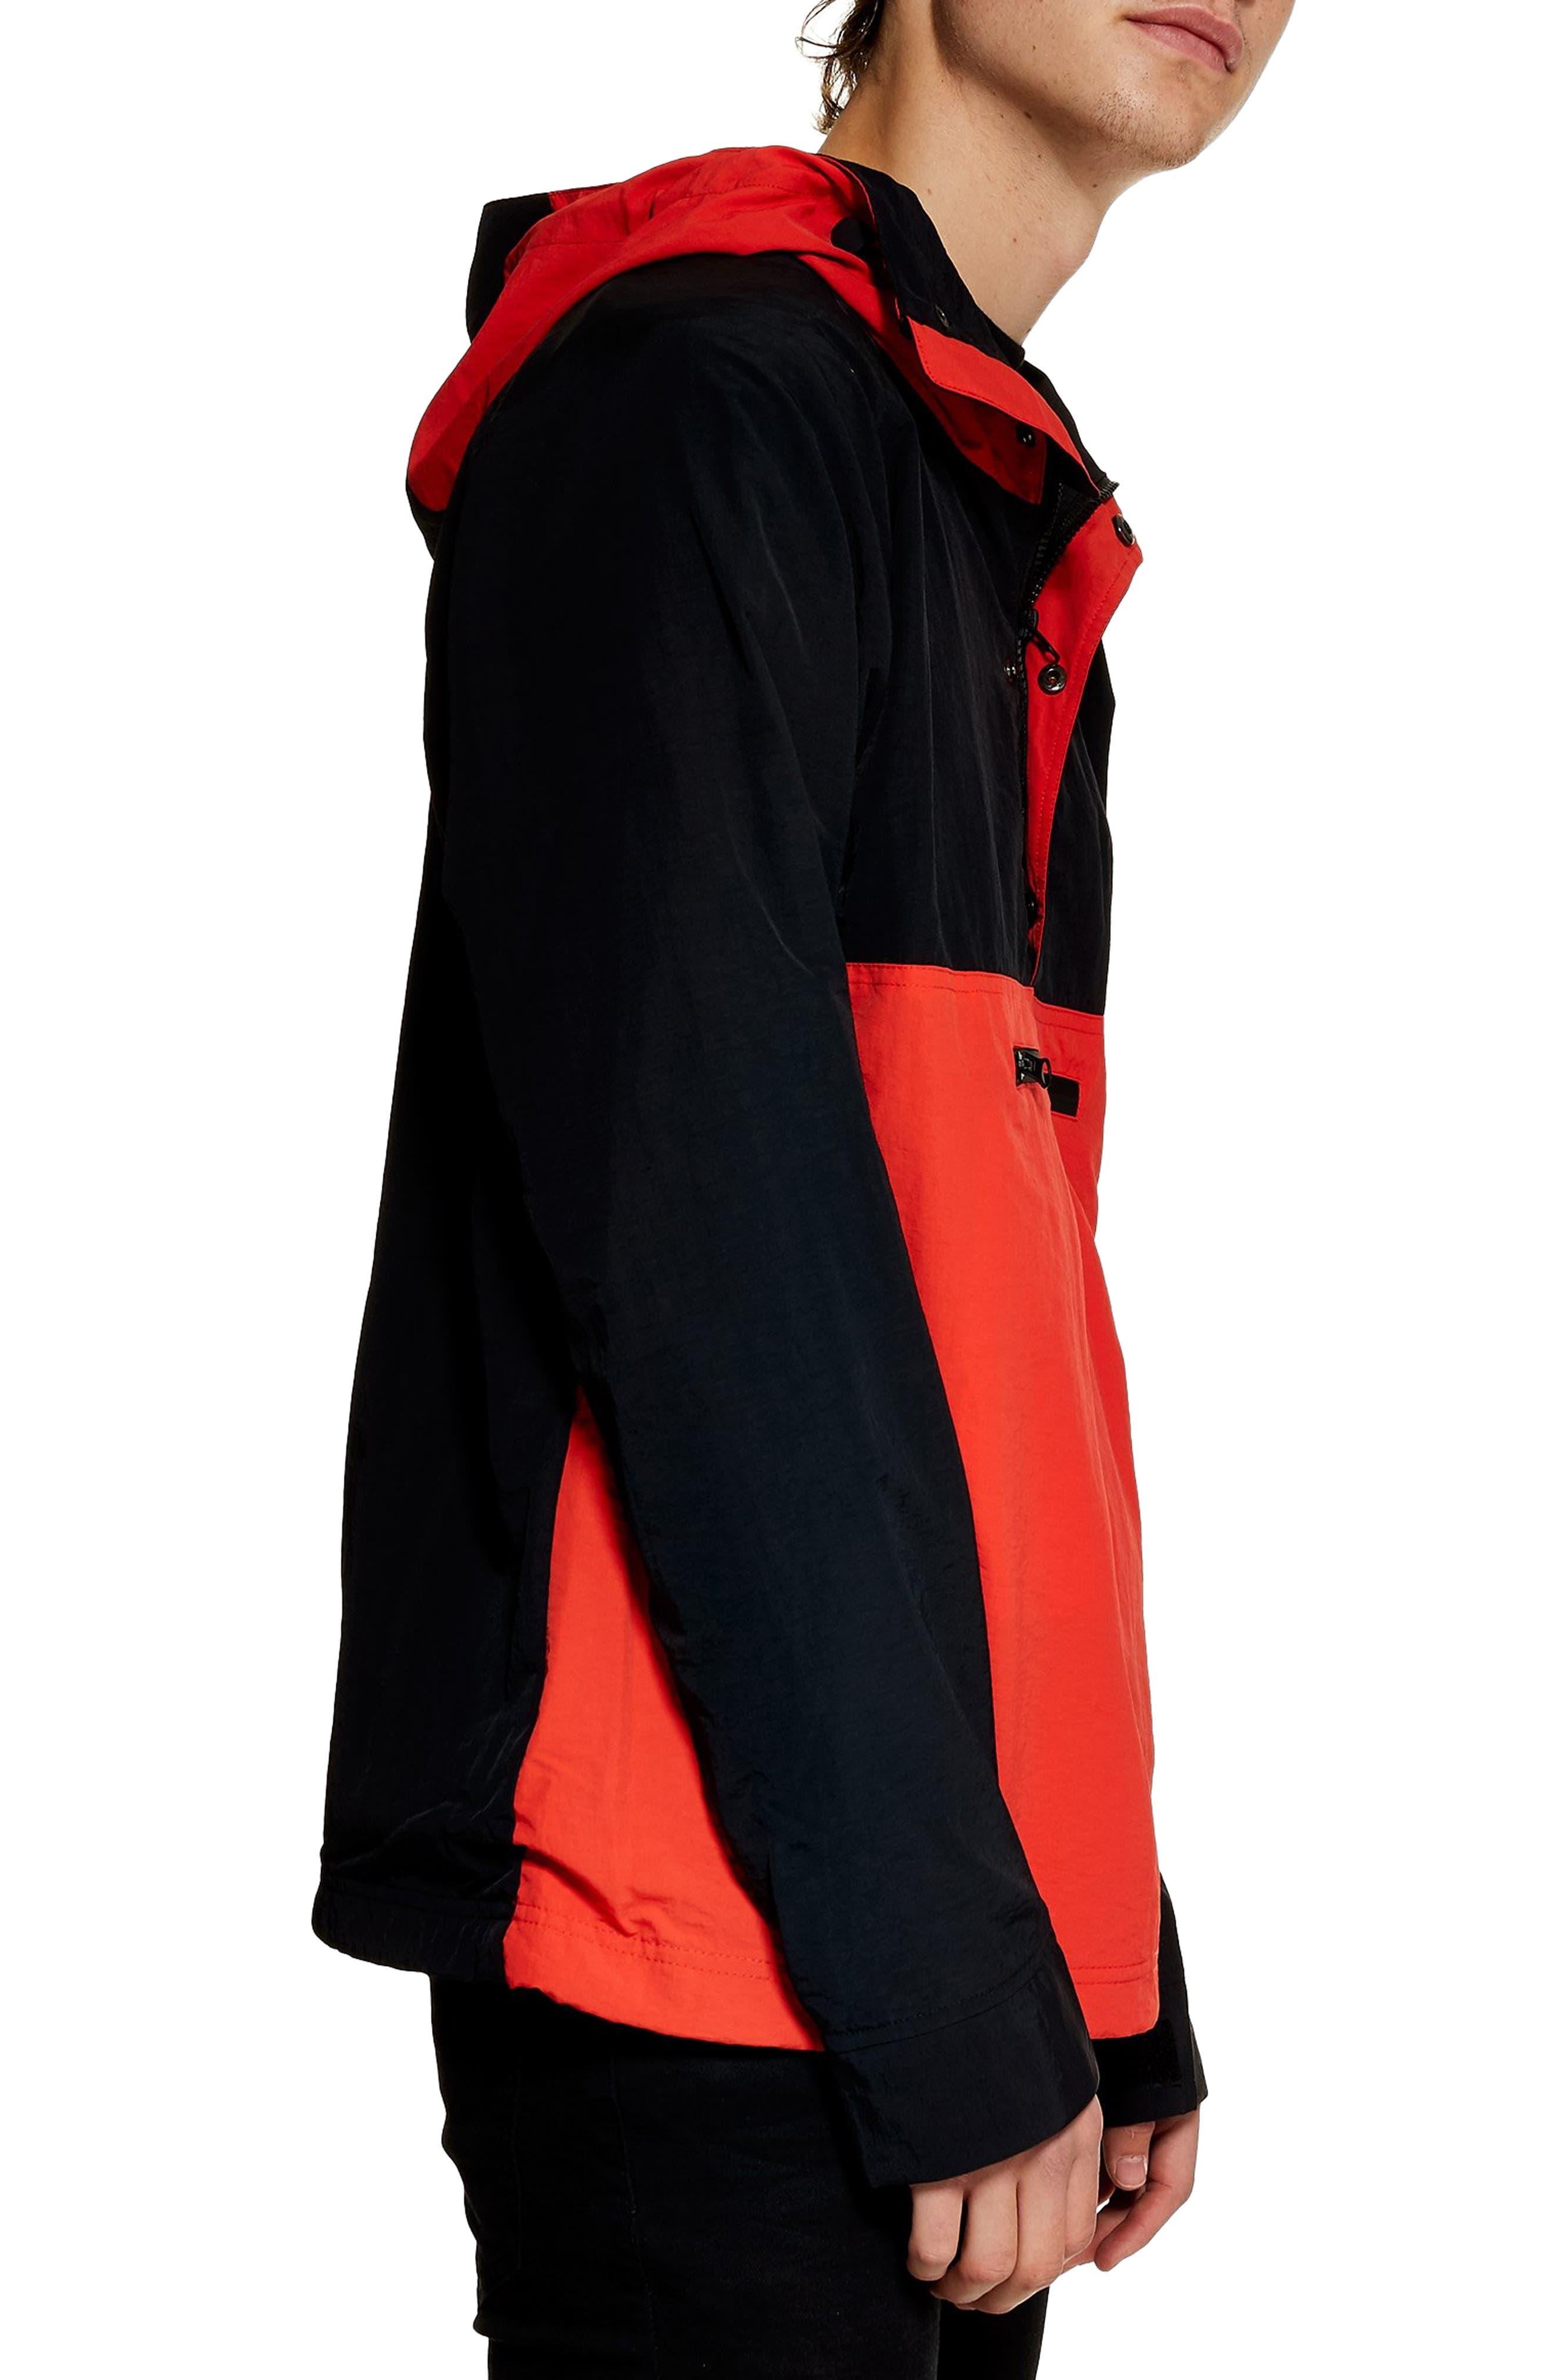 TOPMAN, Hooded Quarter Zip Windbreaker, Alternate thumbnail 4, color, RED MULTI